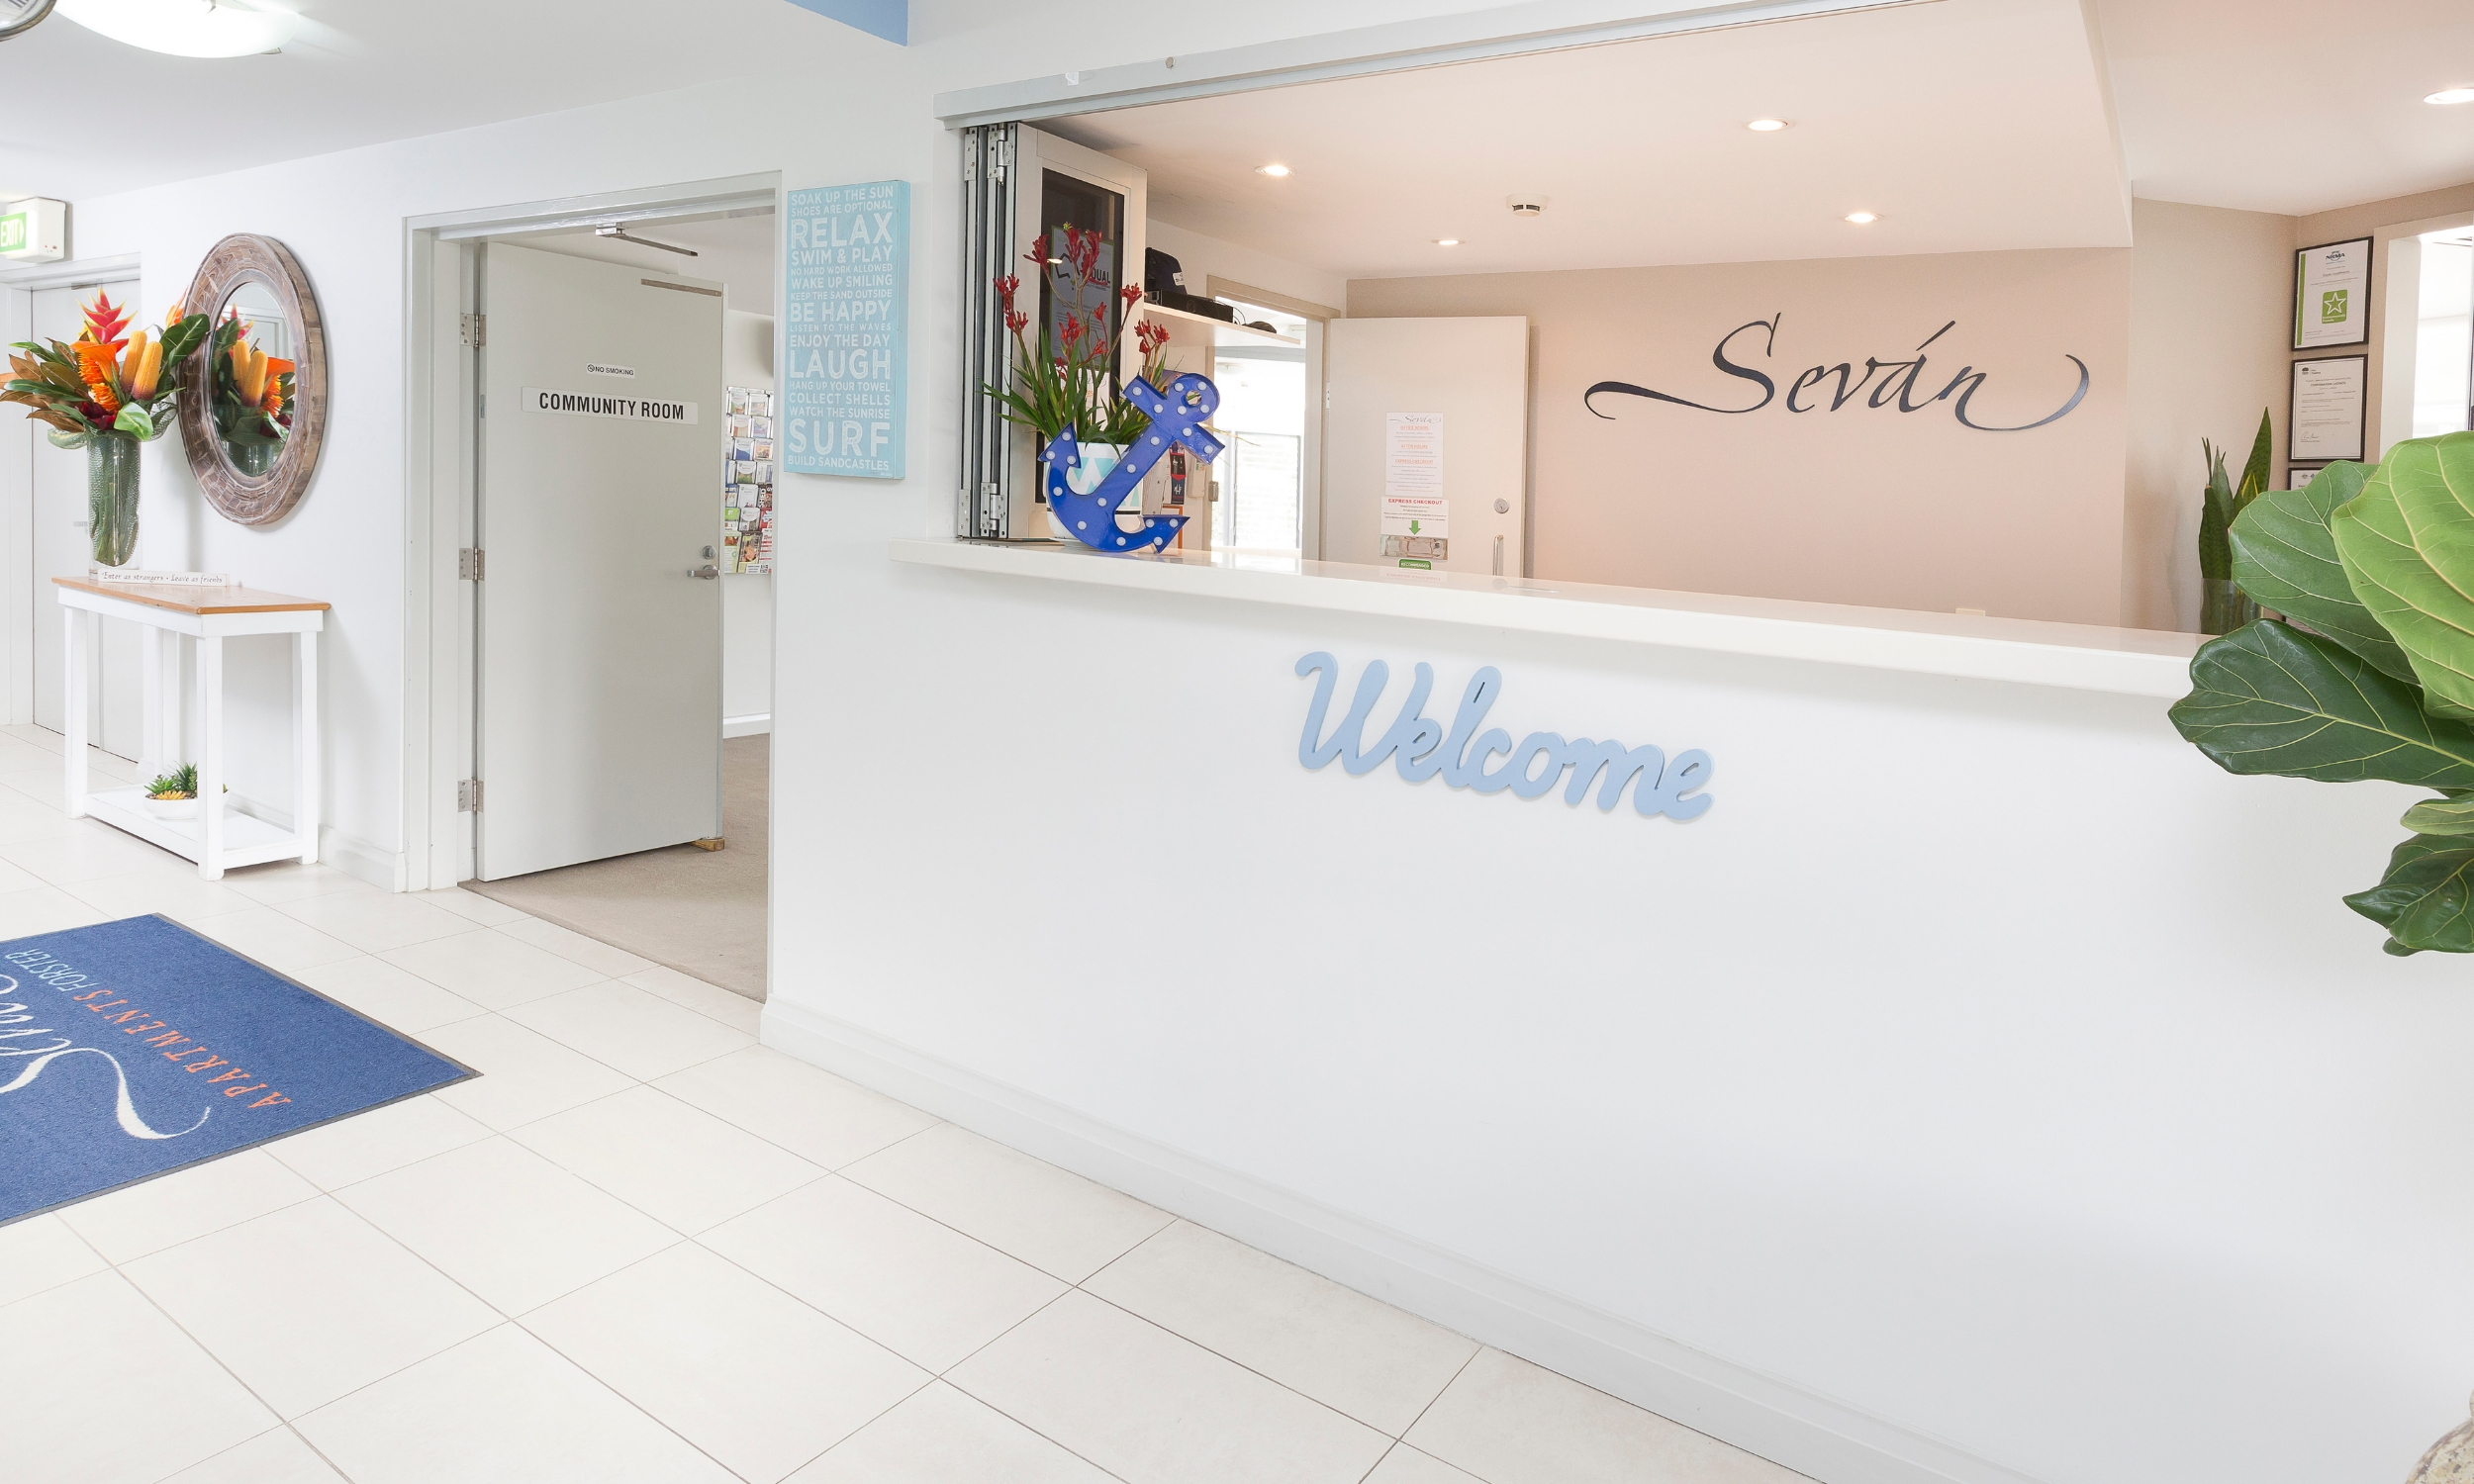 sevan-forster-welcome-home-reception.jpg